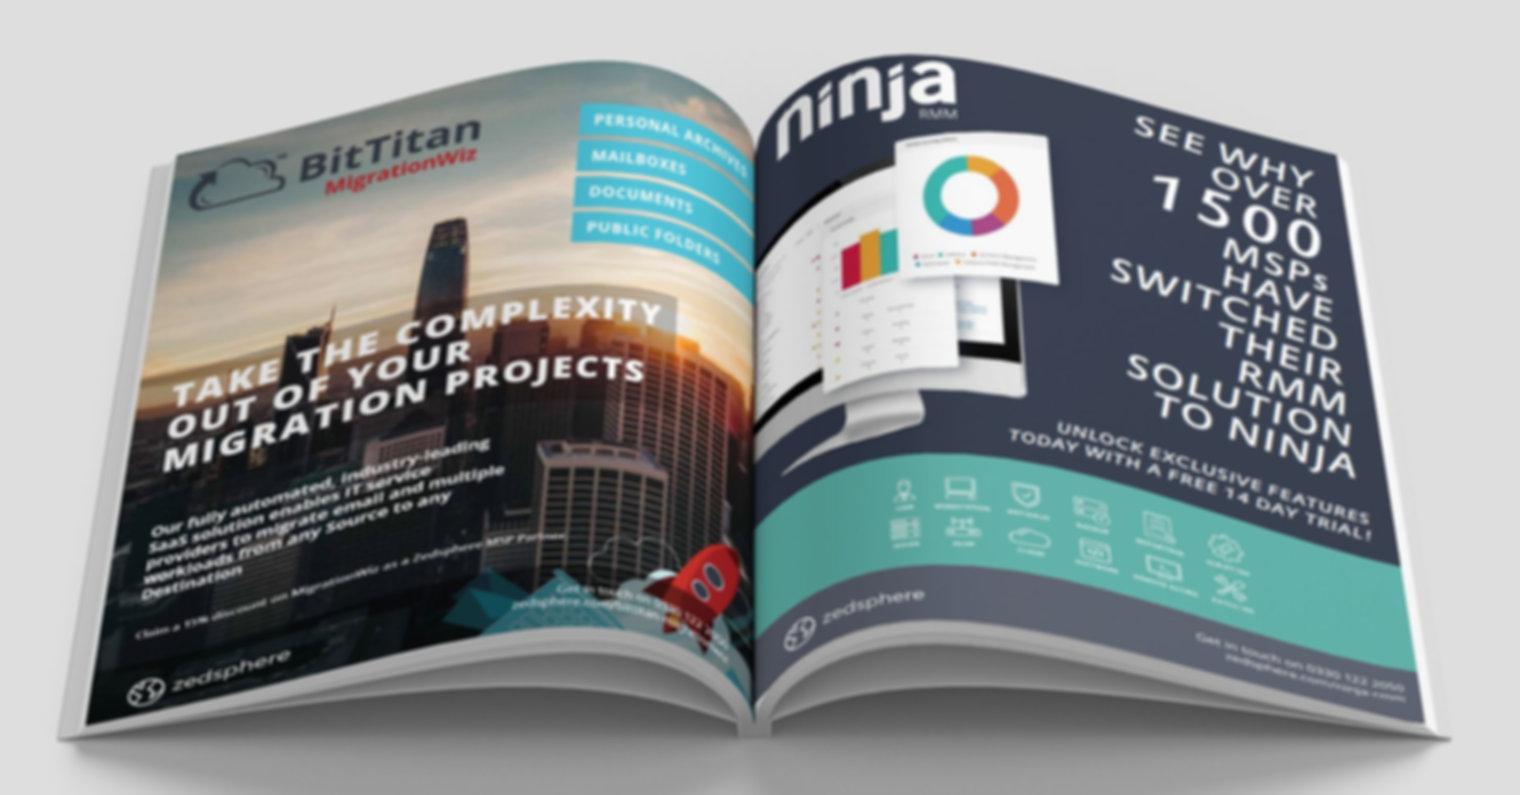 BitTitan and Ninja Adverts.jpg